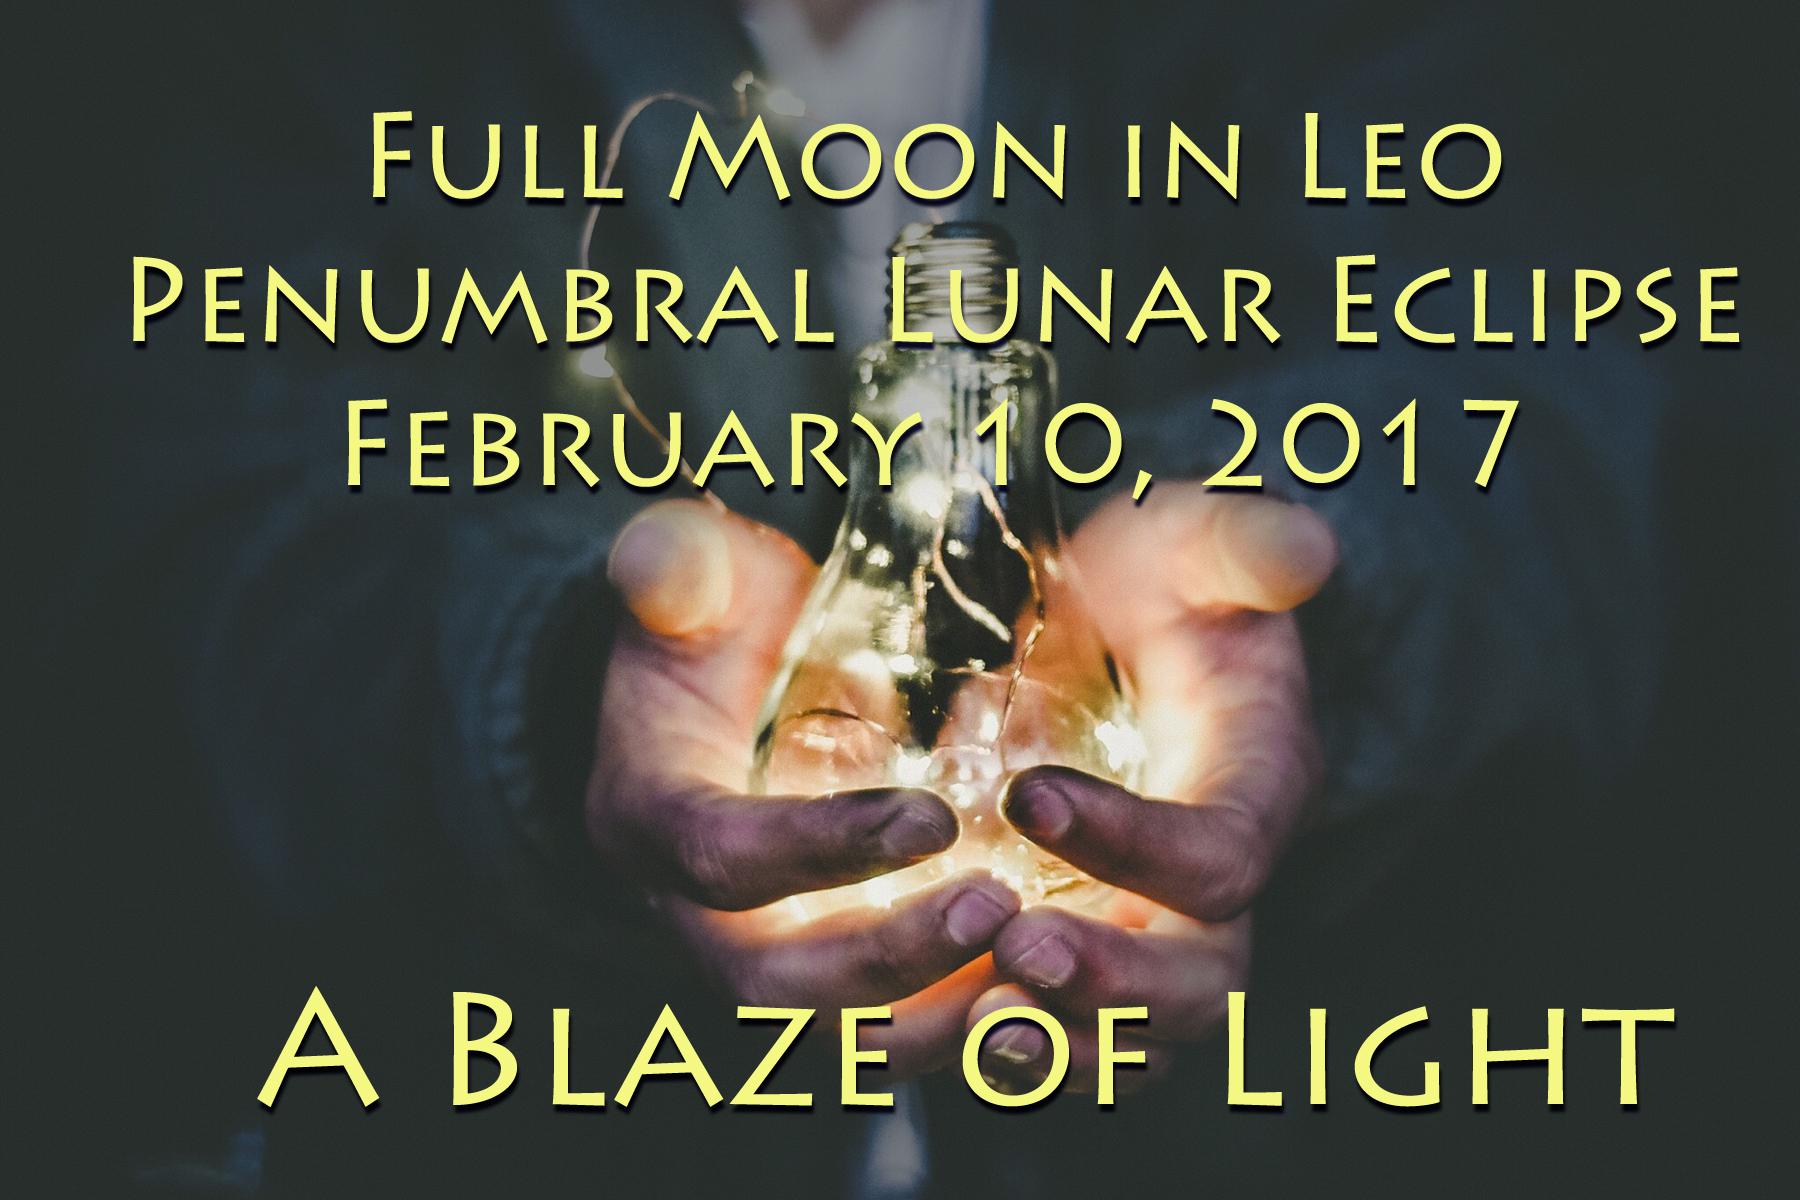 Full Moon in Leo: A Blaze of Light